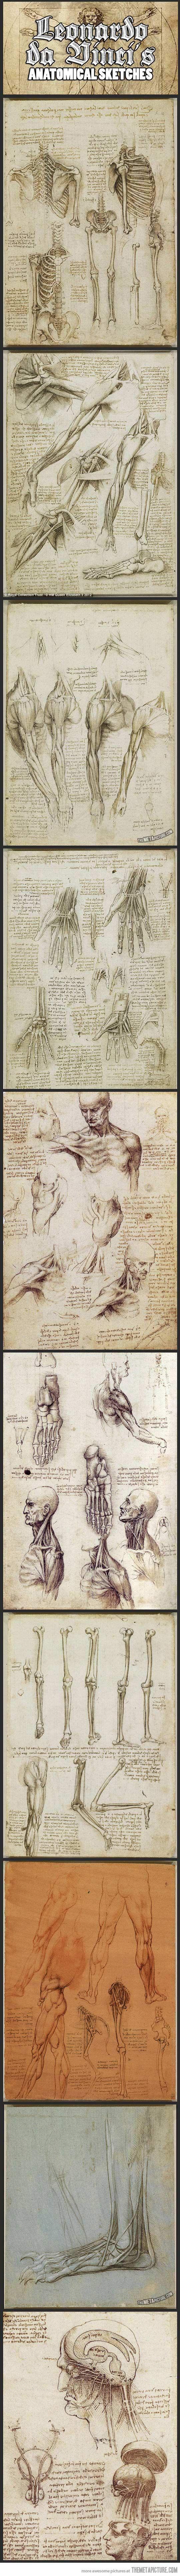 Leonardo da Vinci's anatomical sketches... - The Meta Picture via cgpin.com